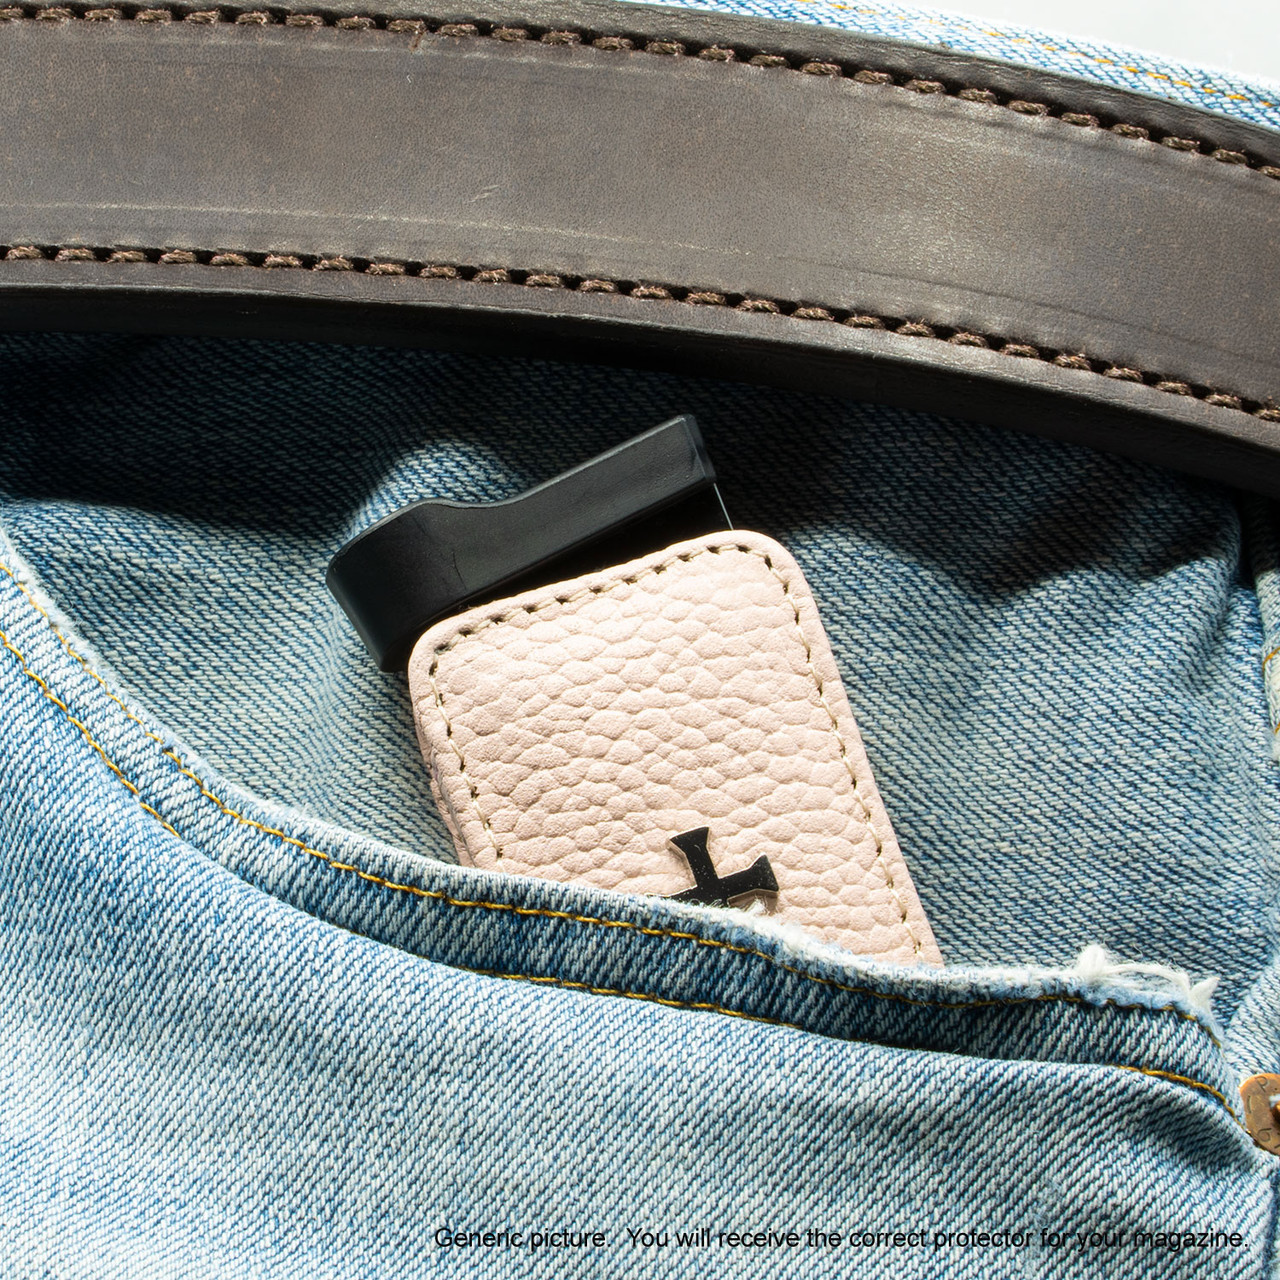 Taurus G2S Pink Carry Faithfully Cross Magazine Pocket Protector